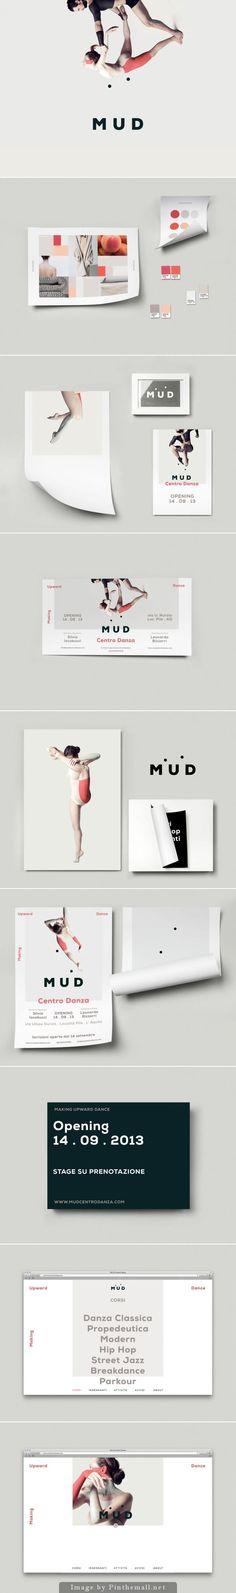 M.U.D Branding   02 iDentity/Business Card   Pinterest